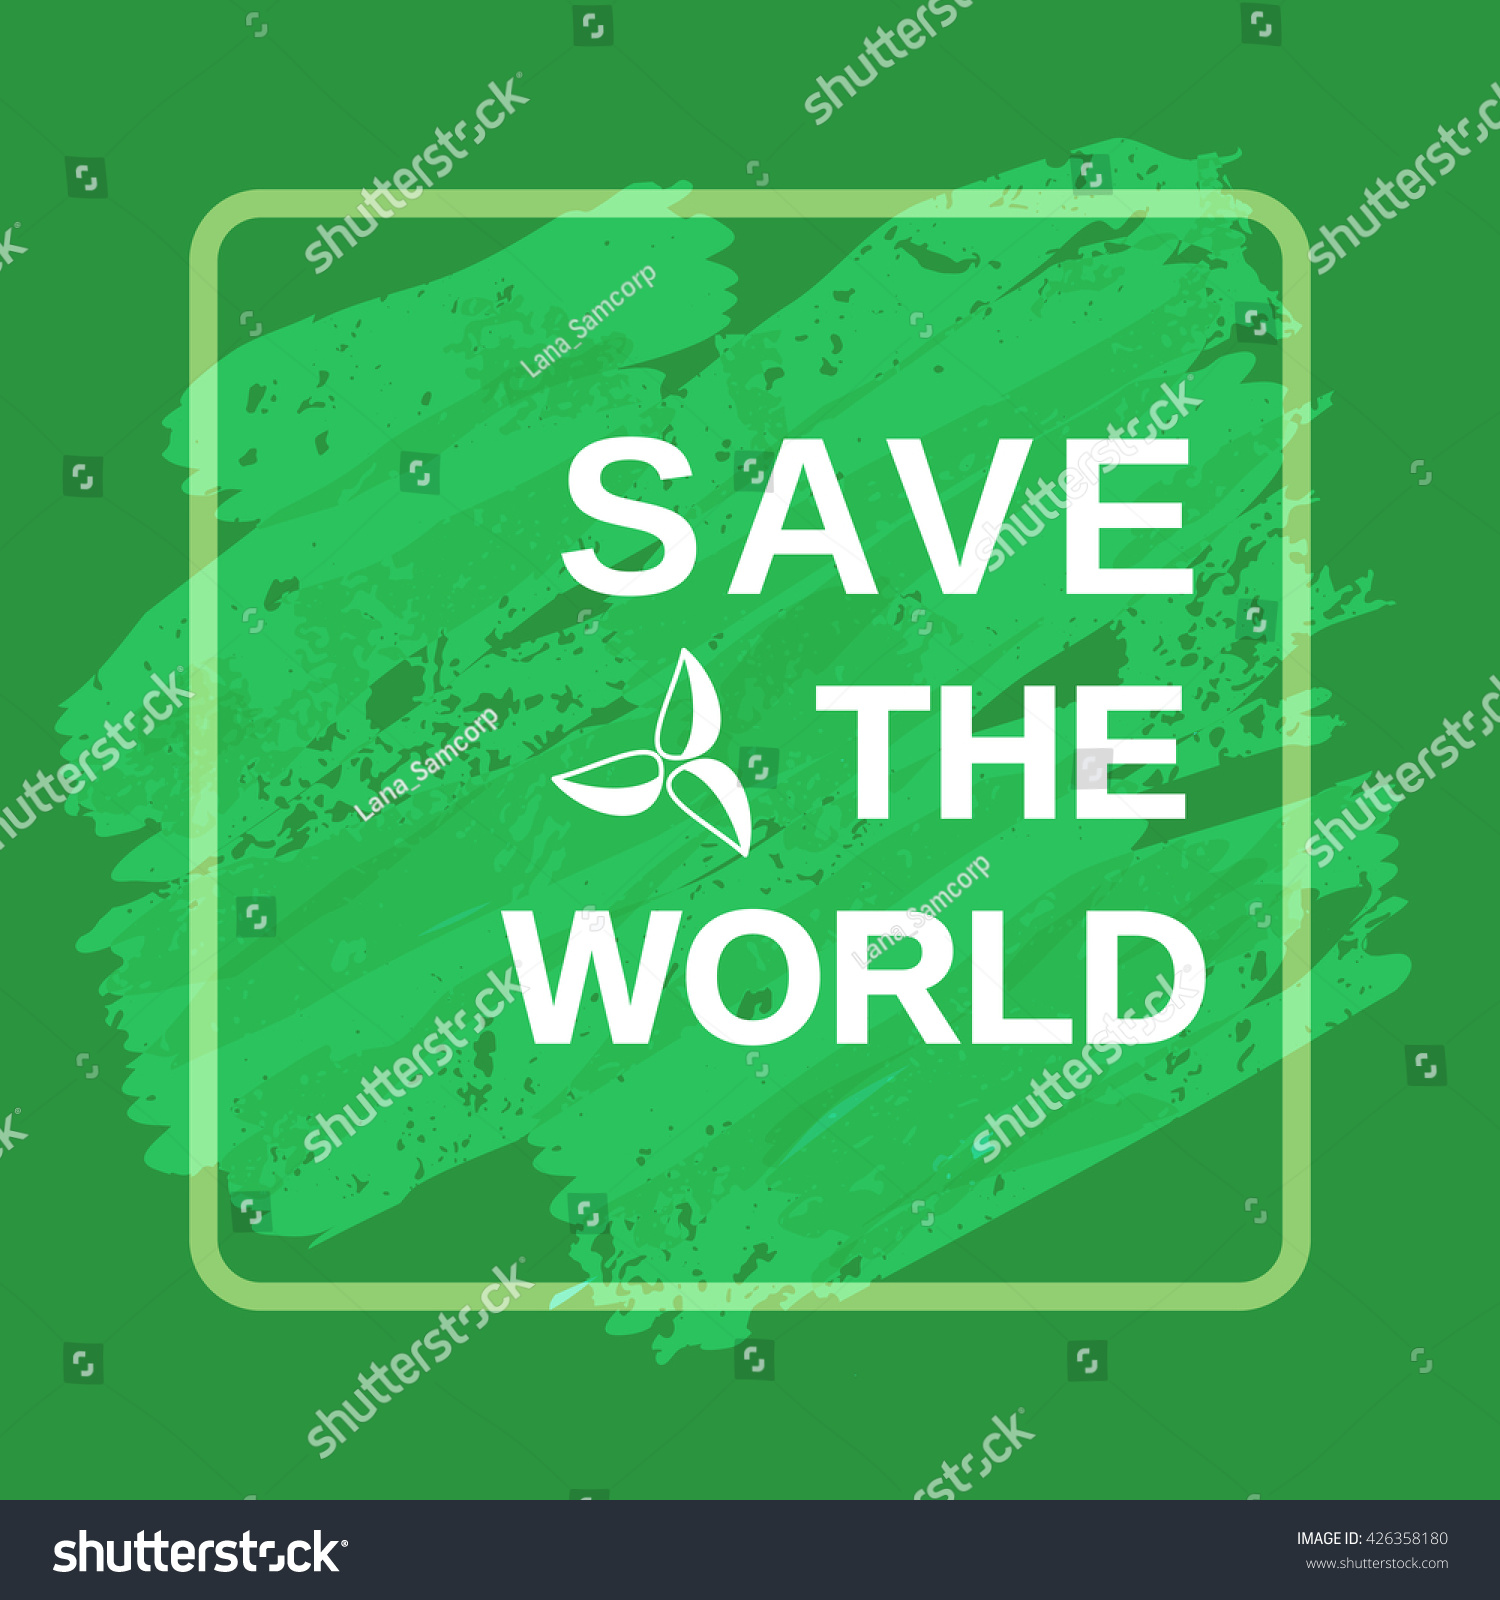 Environmental Slogans And Symbols Www Topsimages Com